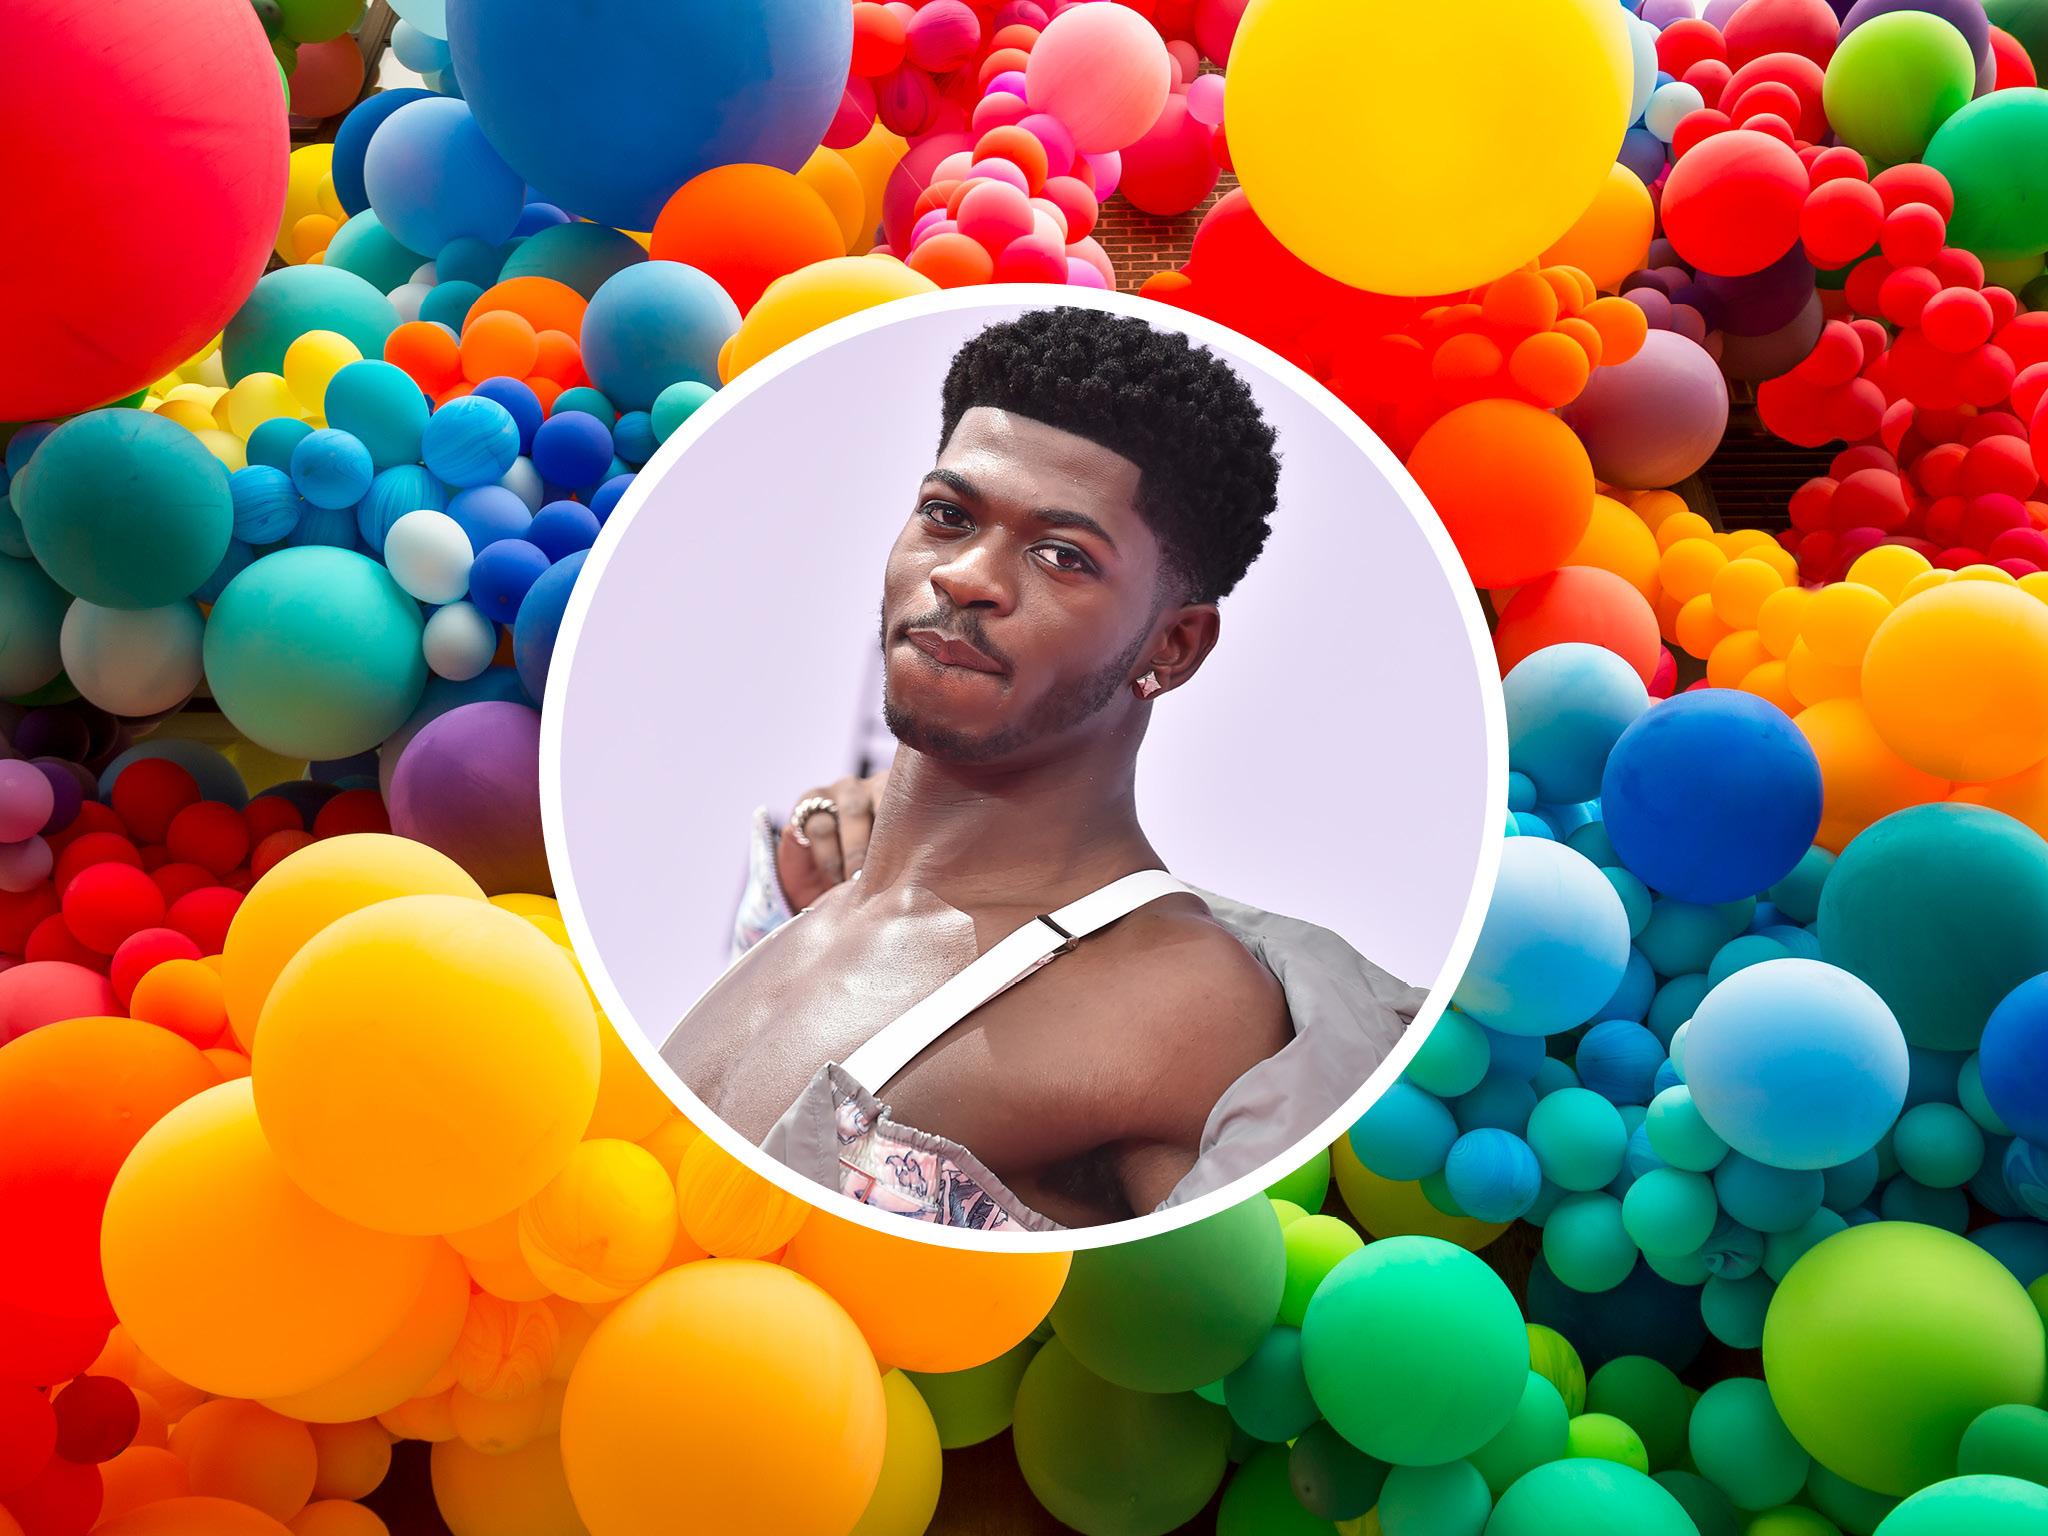 20 Best Gay Songs LGBTQ+ Songs To Celebrate Pride All Year